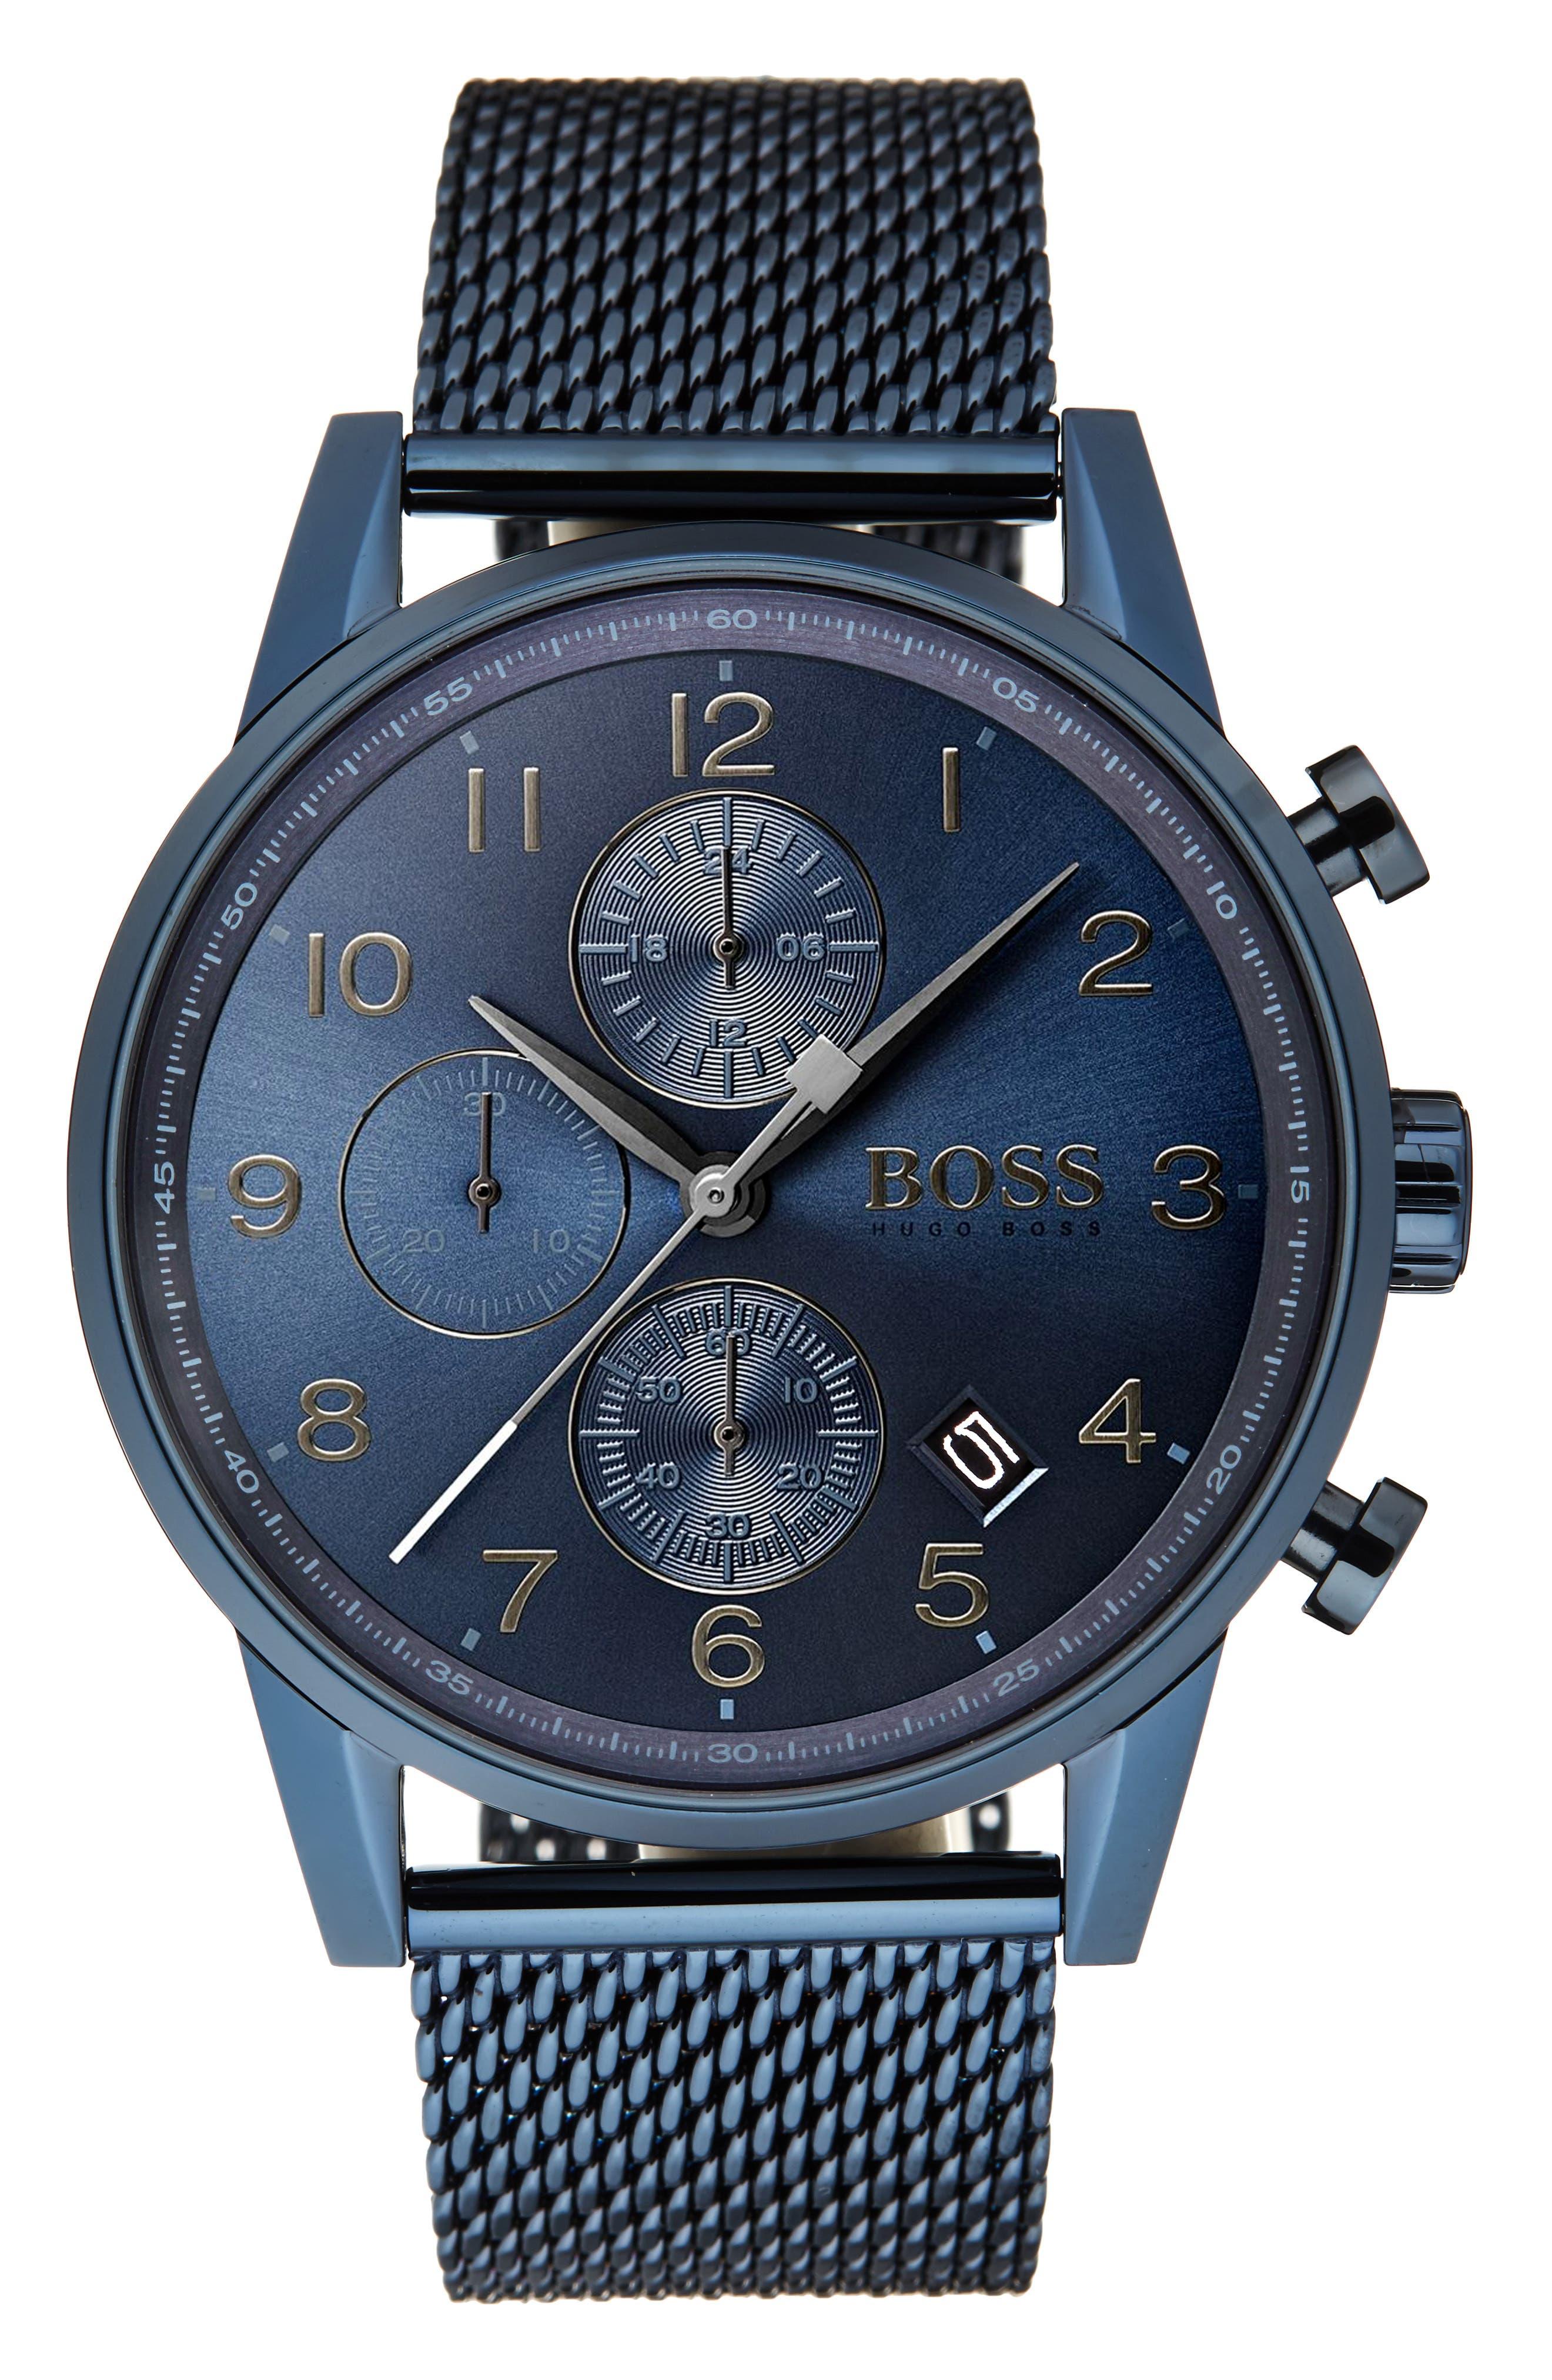 c10c2698663 BOSS by HUGO BOSS Men s Watches